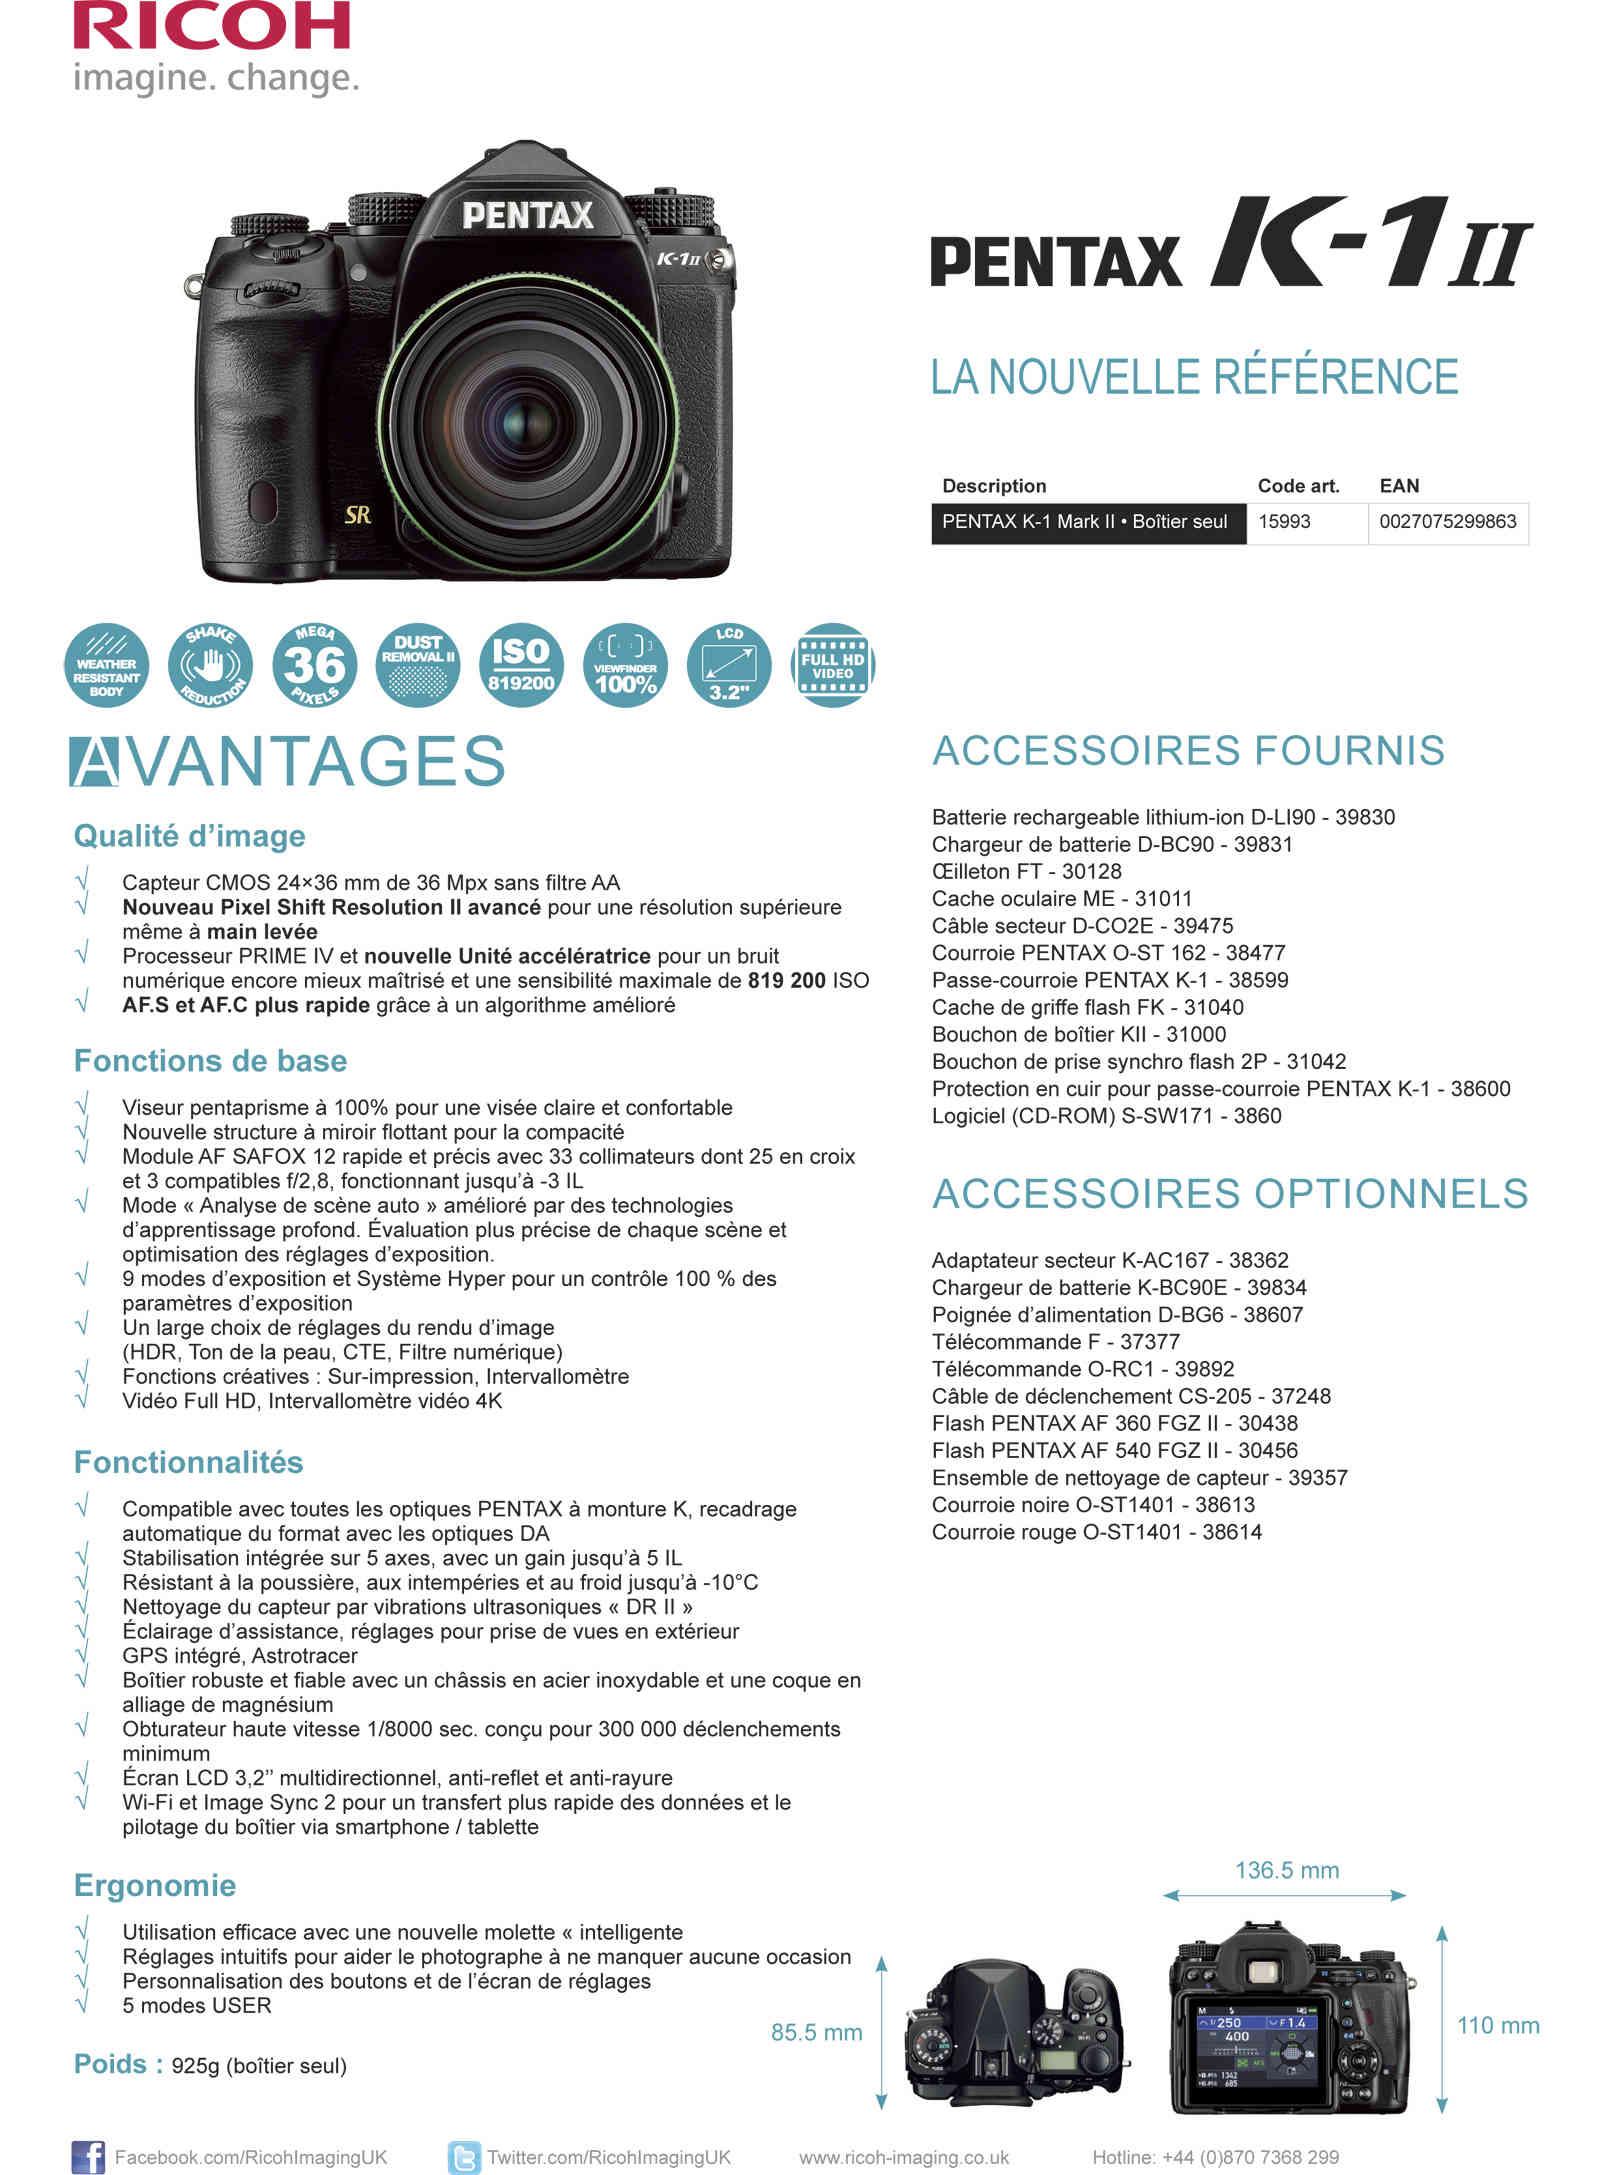 PENTAX RICOH IMAGING - Communiqué de Presse 22/02/2018 - K-1 Mark II Fiche_10